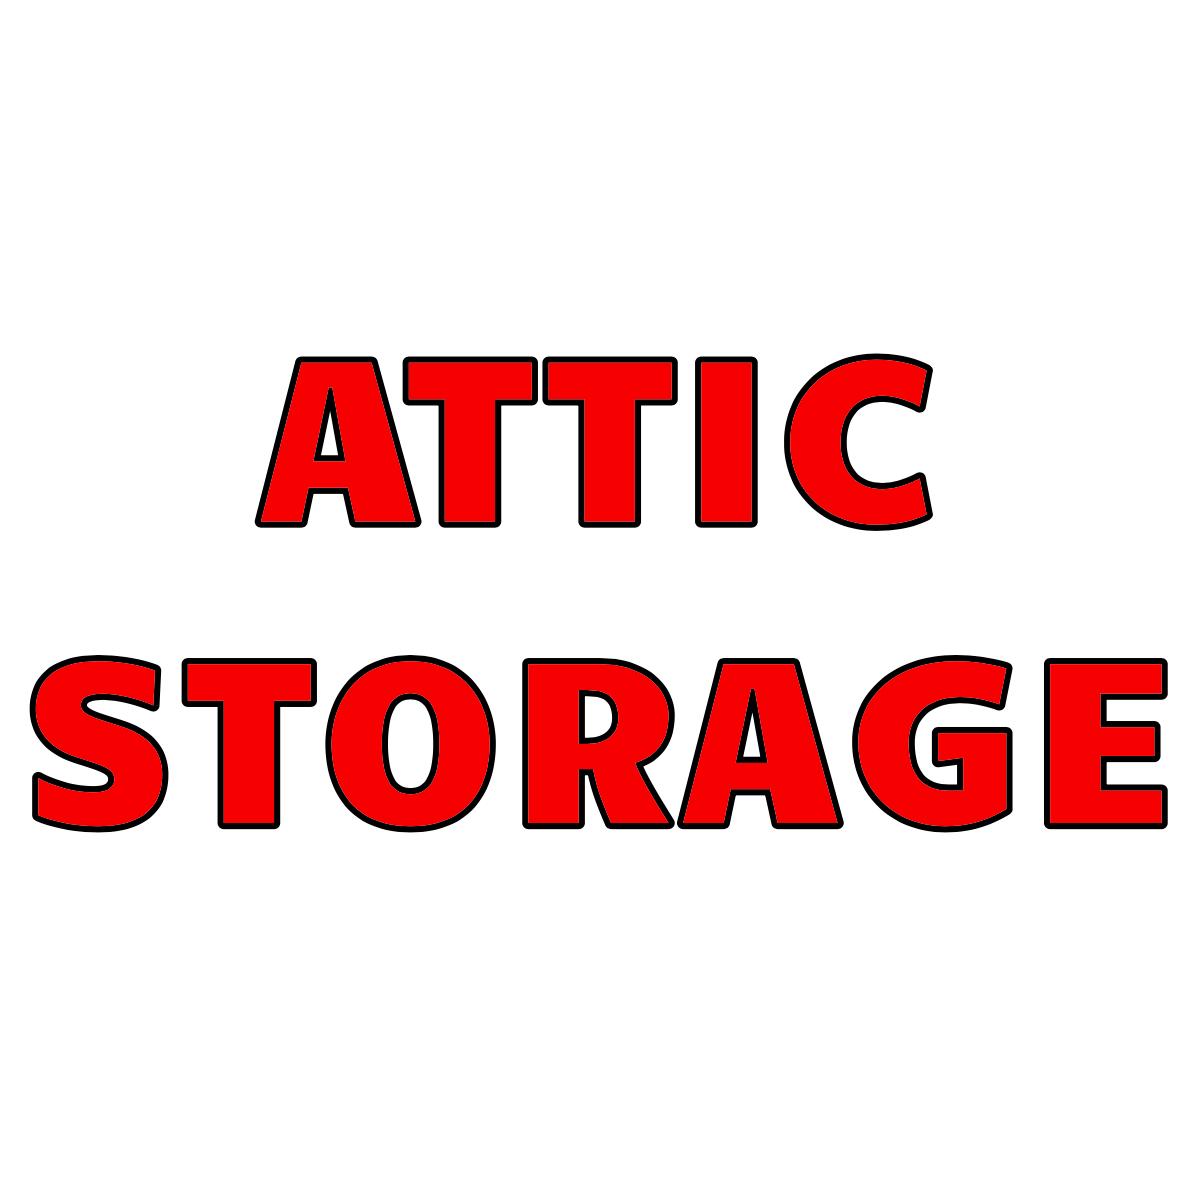 Attic Storage #4